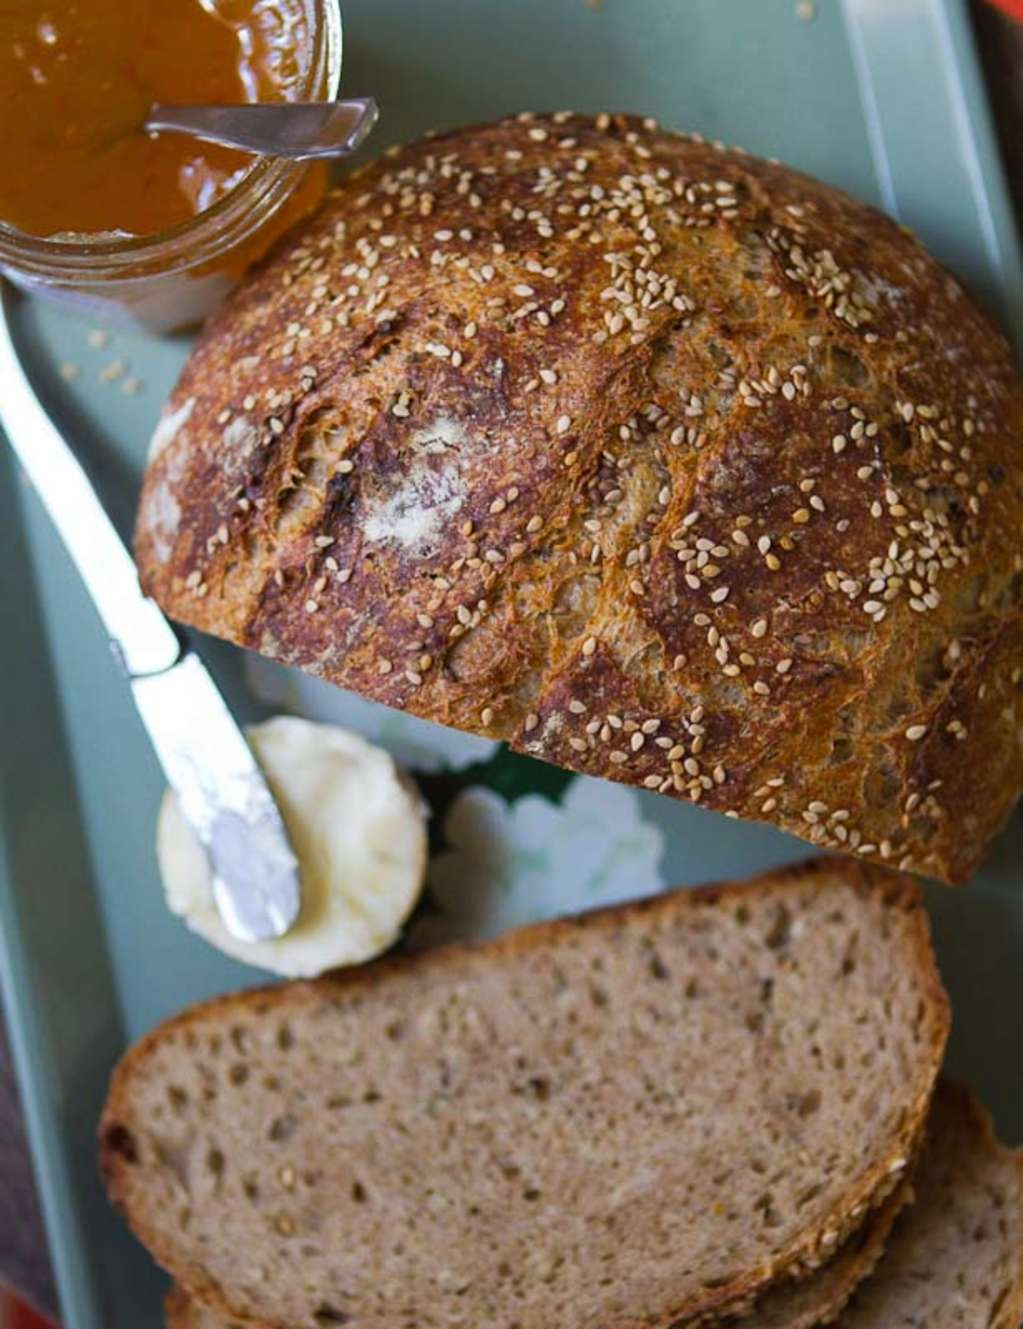 Baking Recipe: Seeded Whole Wheat Overnight Bread